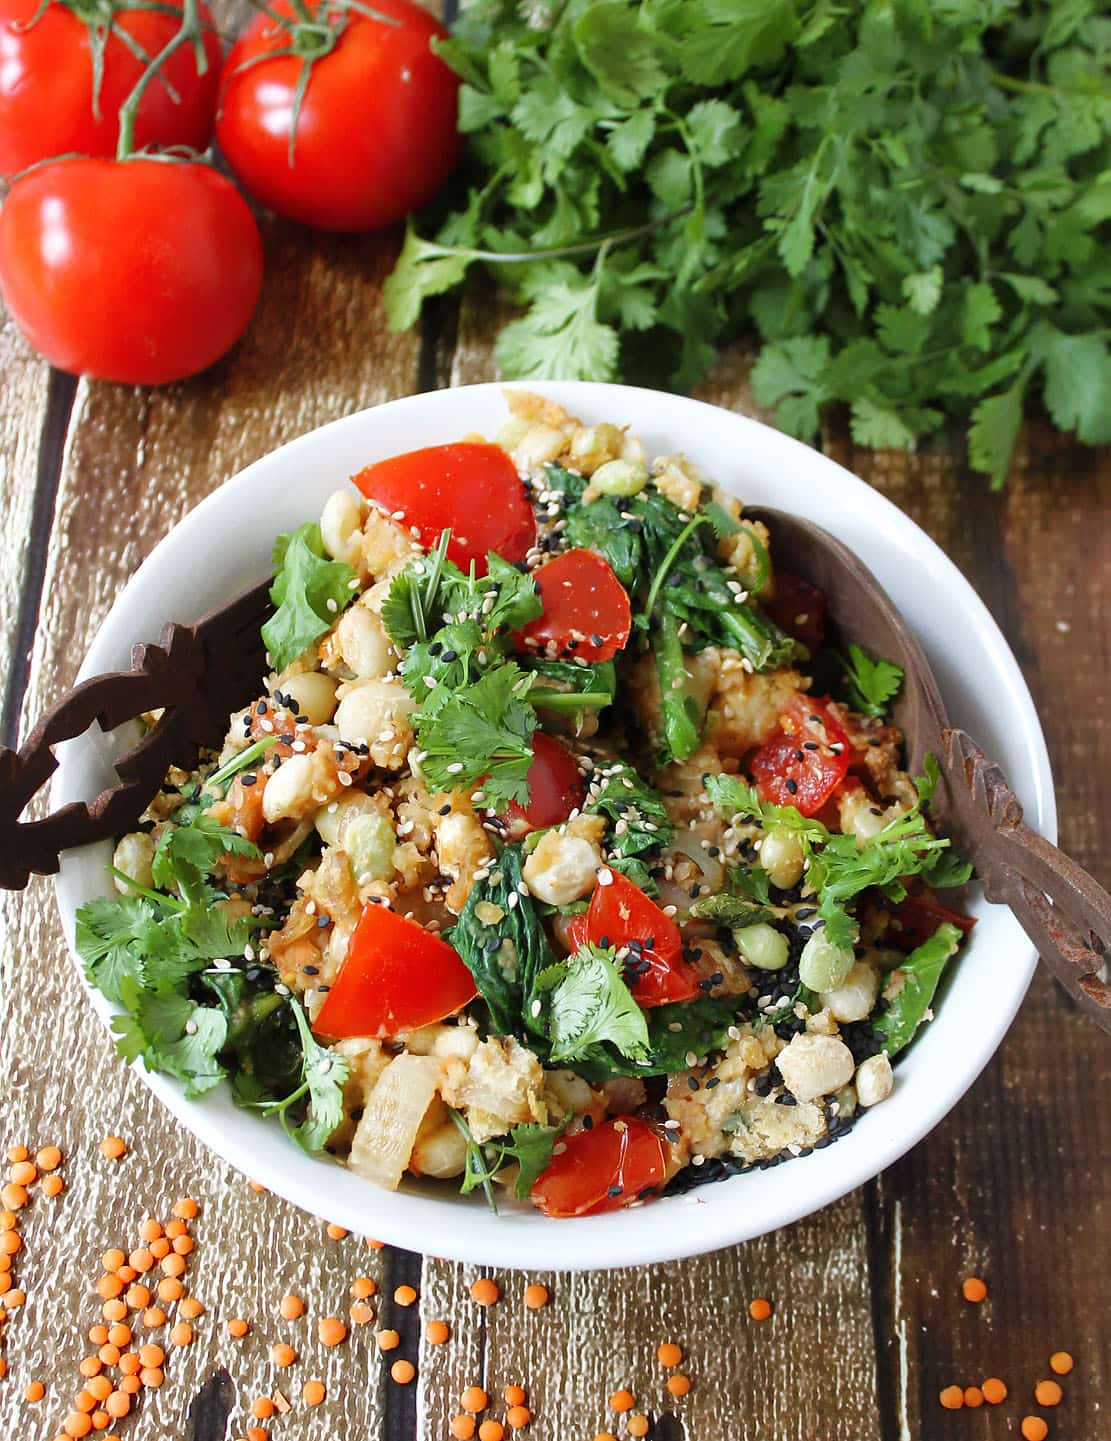 Warm Lentil Salad ggnoads